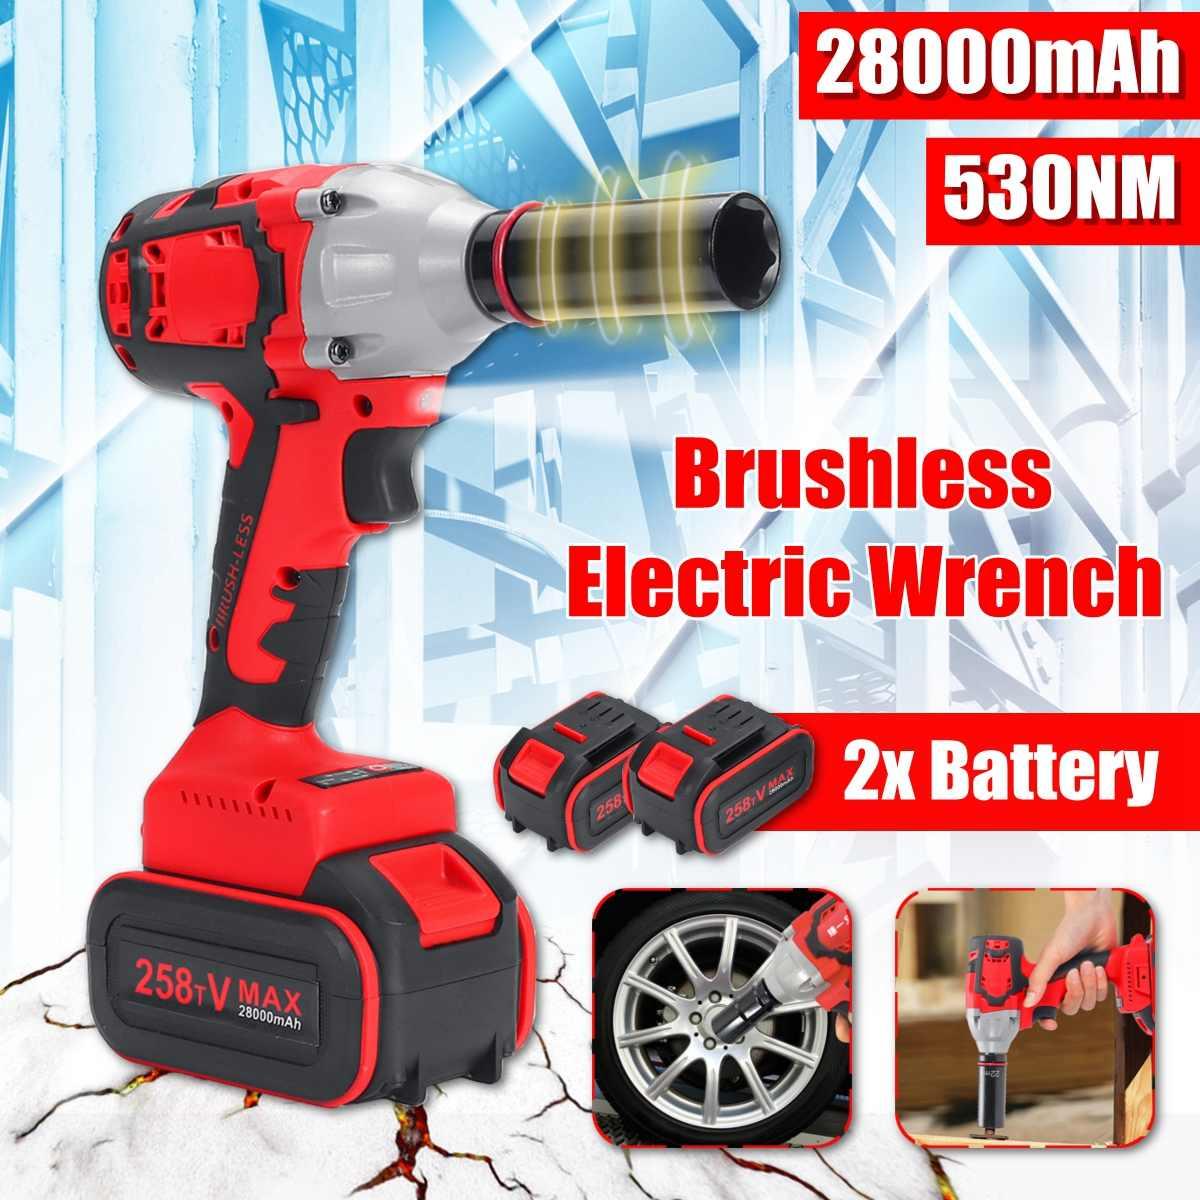 21V 8AH Brushless Cordless Impact Electric Wrench 530Nm 28000mah Torque Household Car/SUV Wheel 1/2